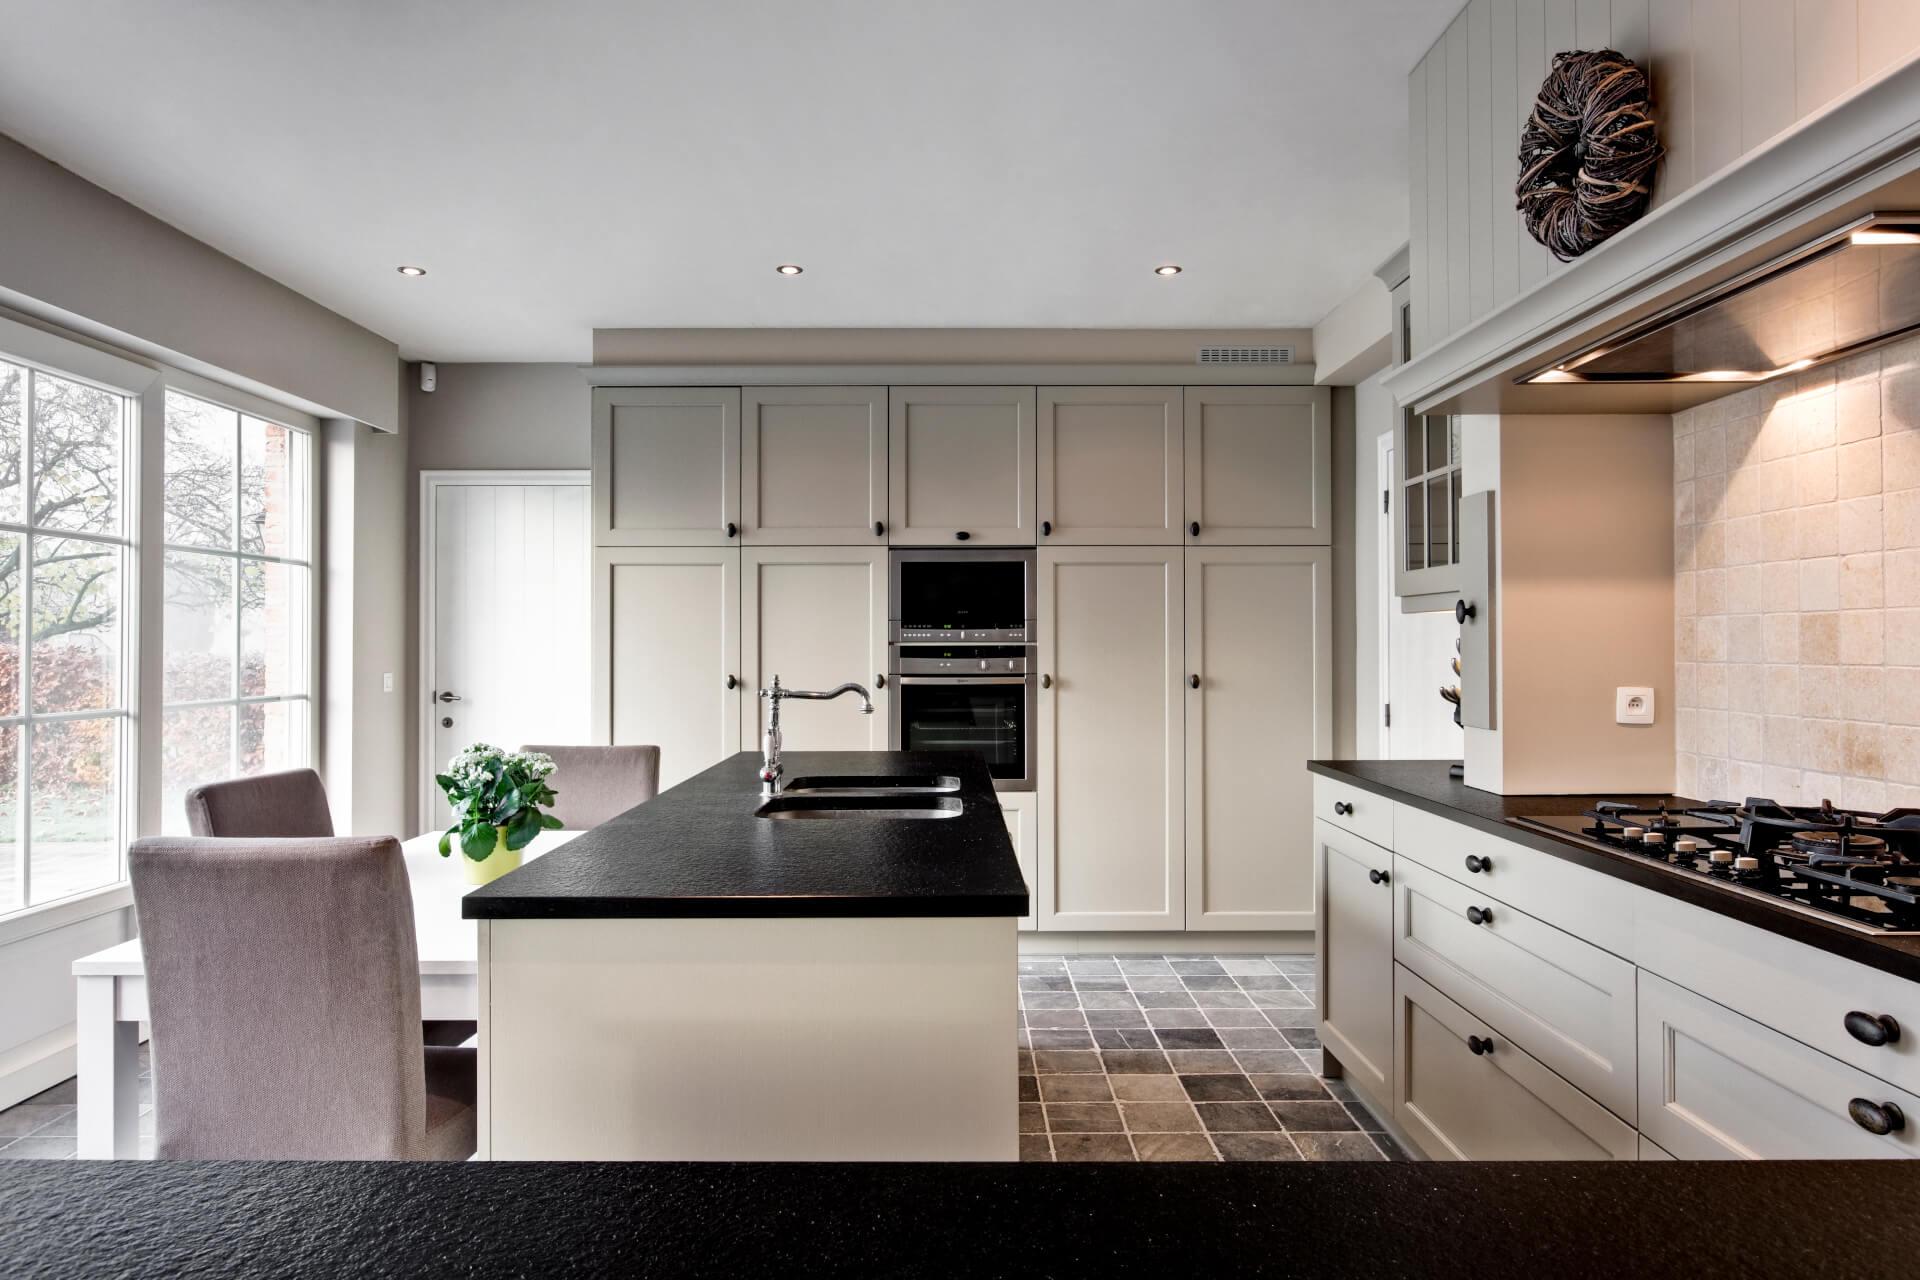 Creato keukens home - Keuken minimalistisch design ...